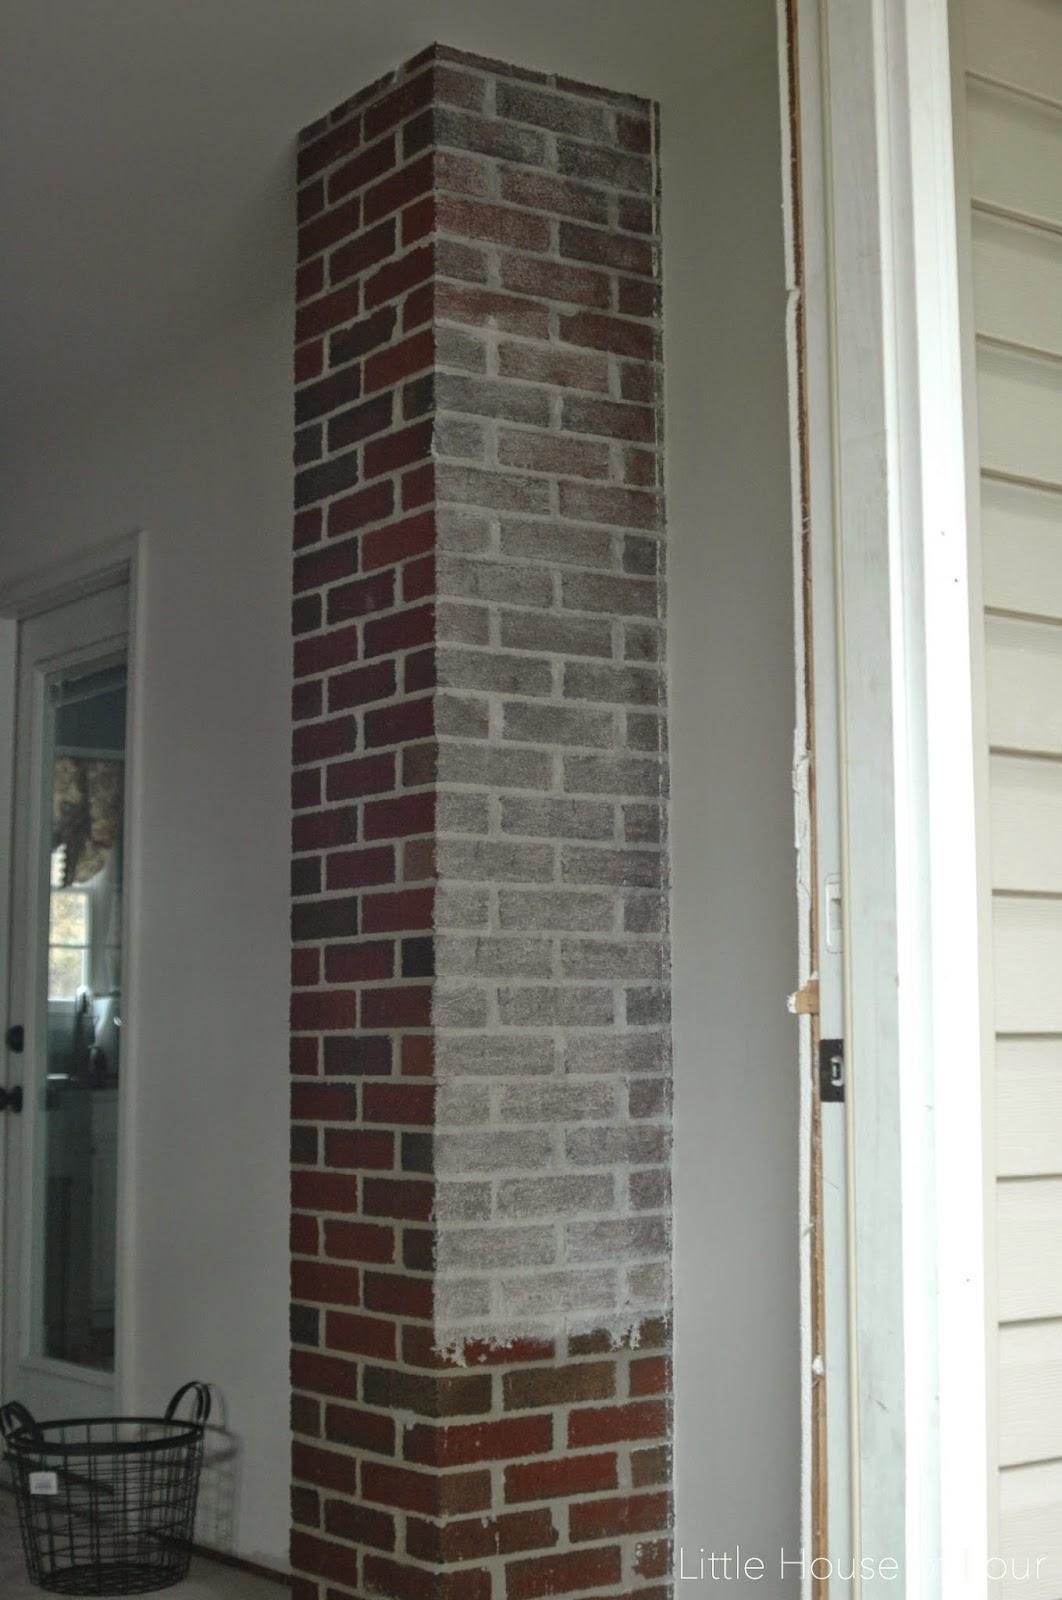 How To Whitewash Brick Mudroom Progress Whitewashed Brick Little House Of Four